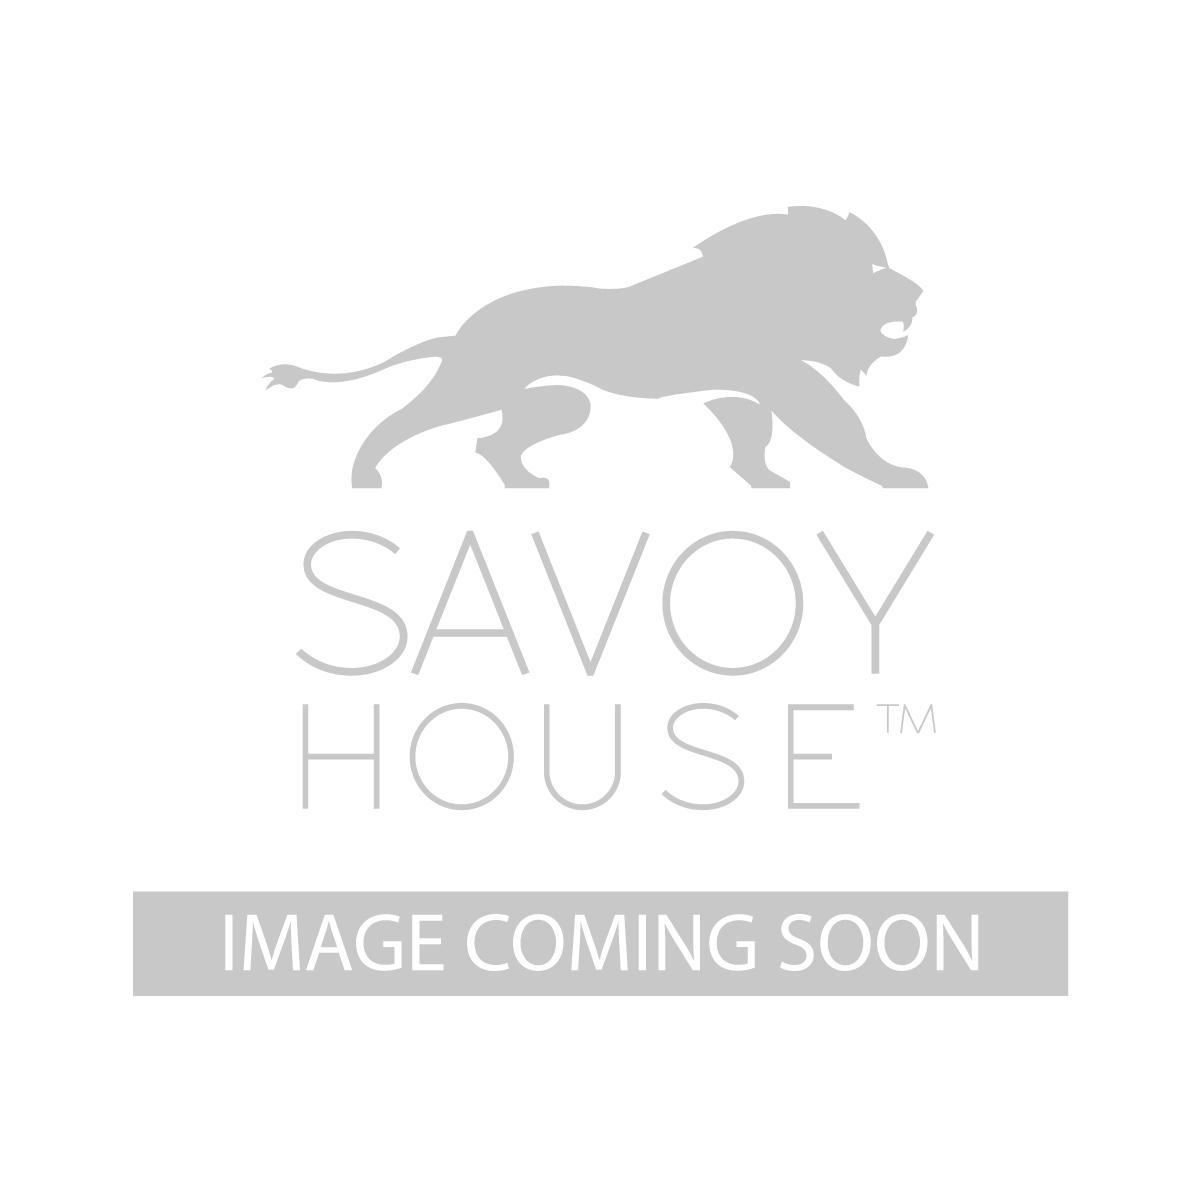 52 135 5CN SN Trudy 52 inch 5 Blade Ceiling Fan by Savoy House